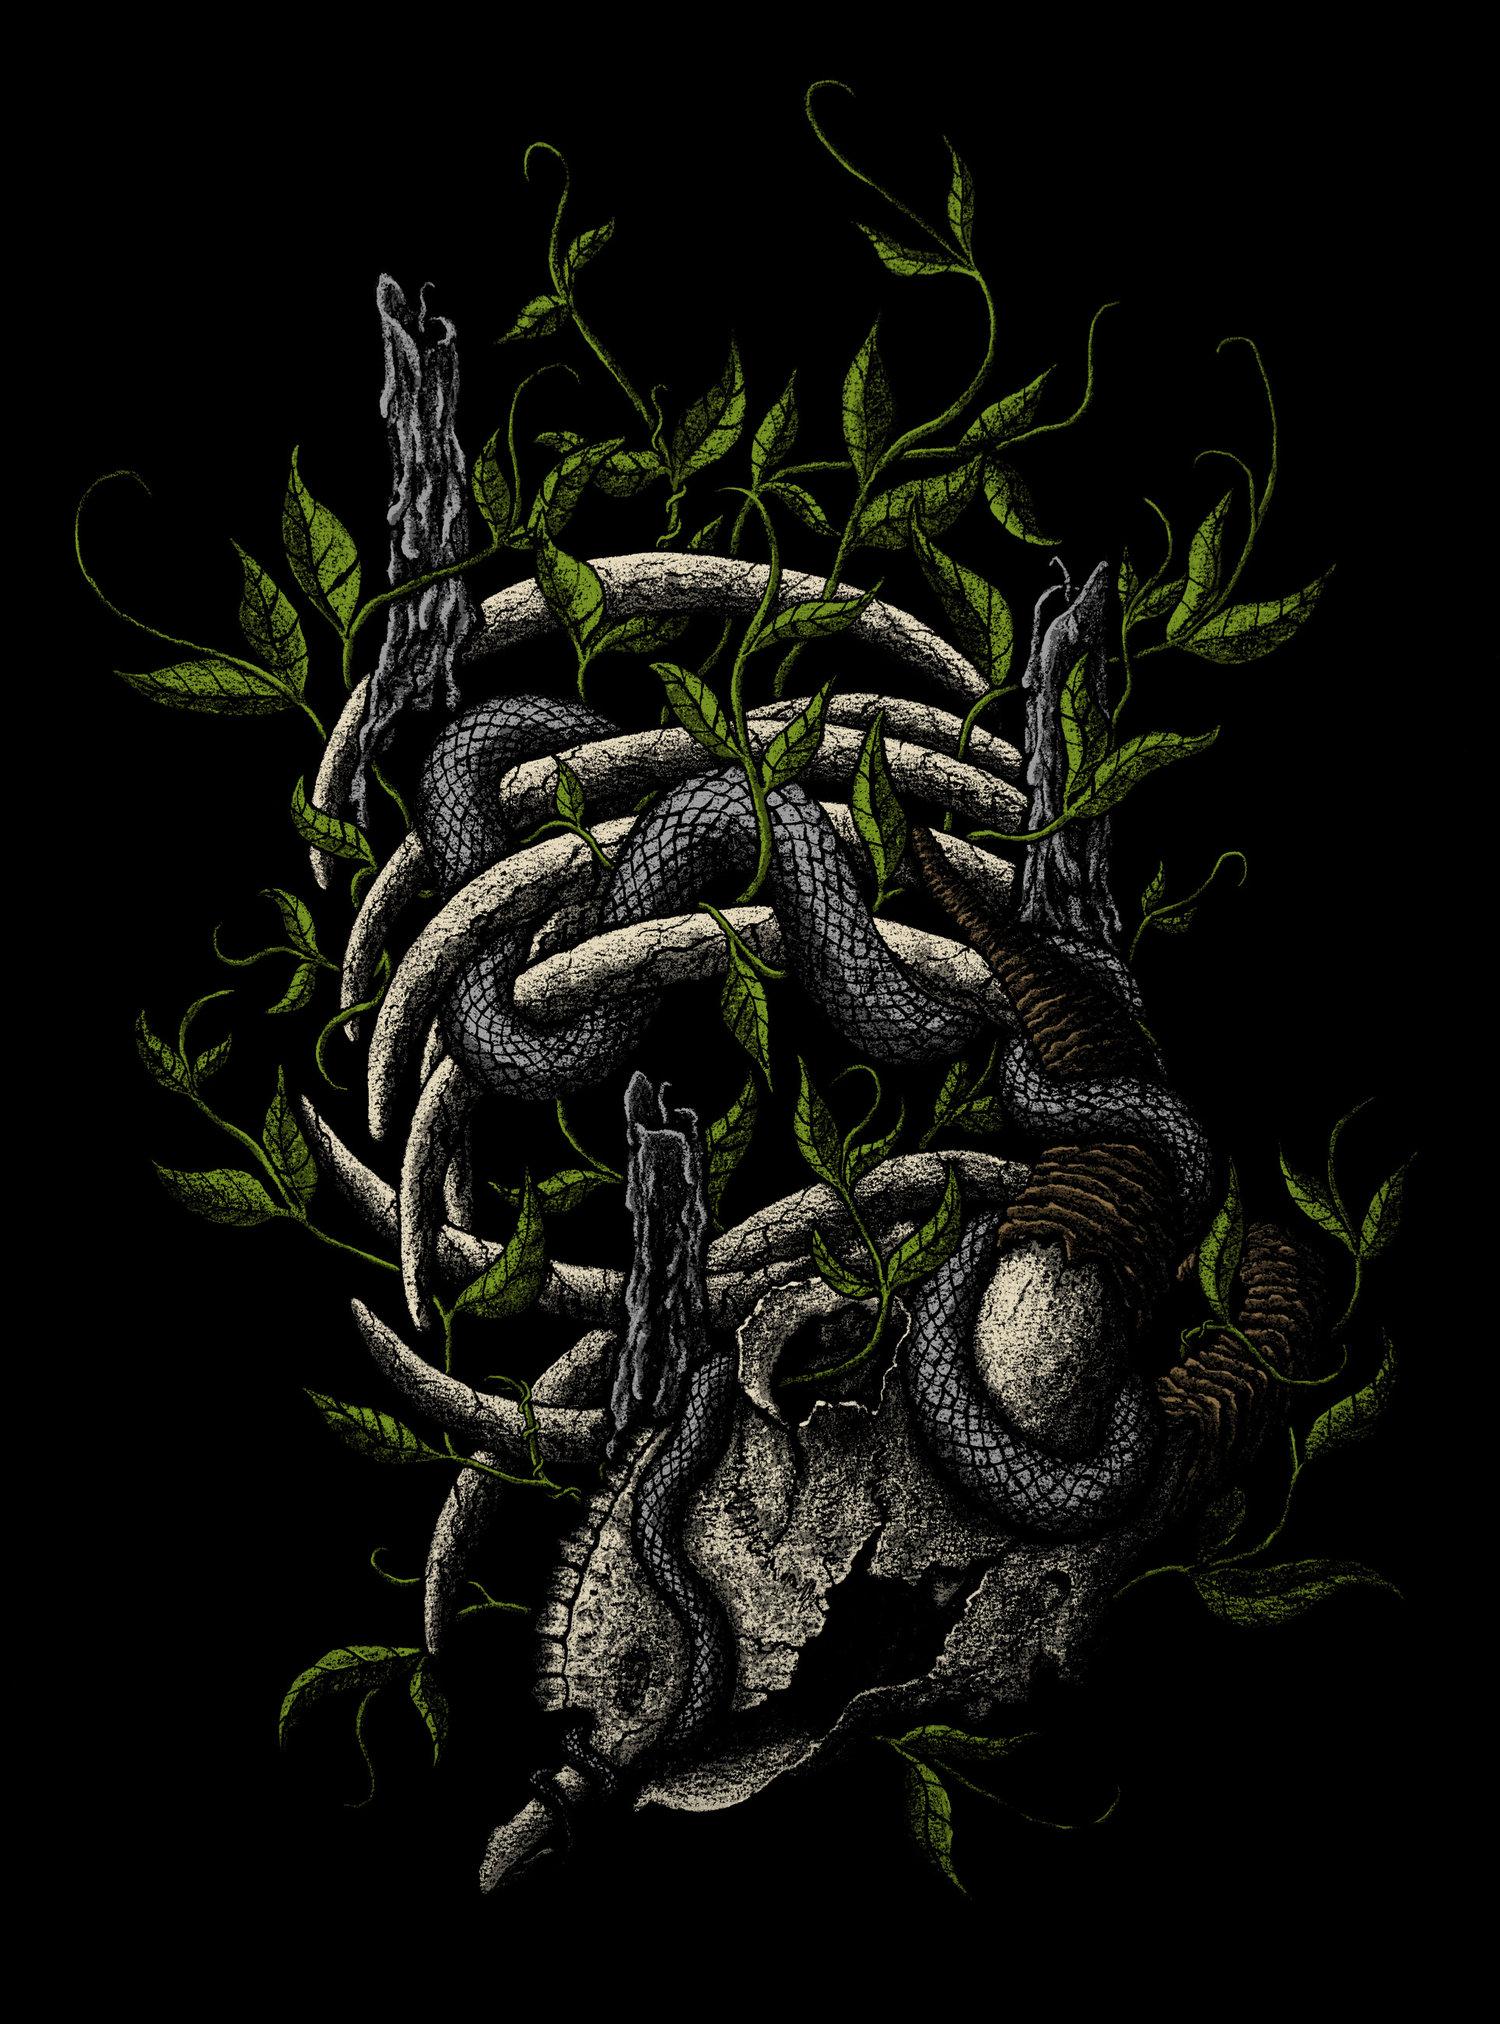 Blind+Worm's+Sting+color.jpg